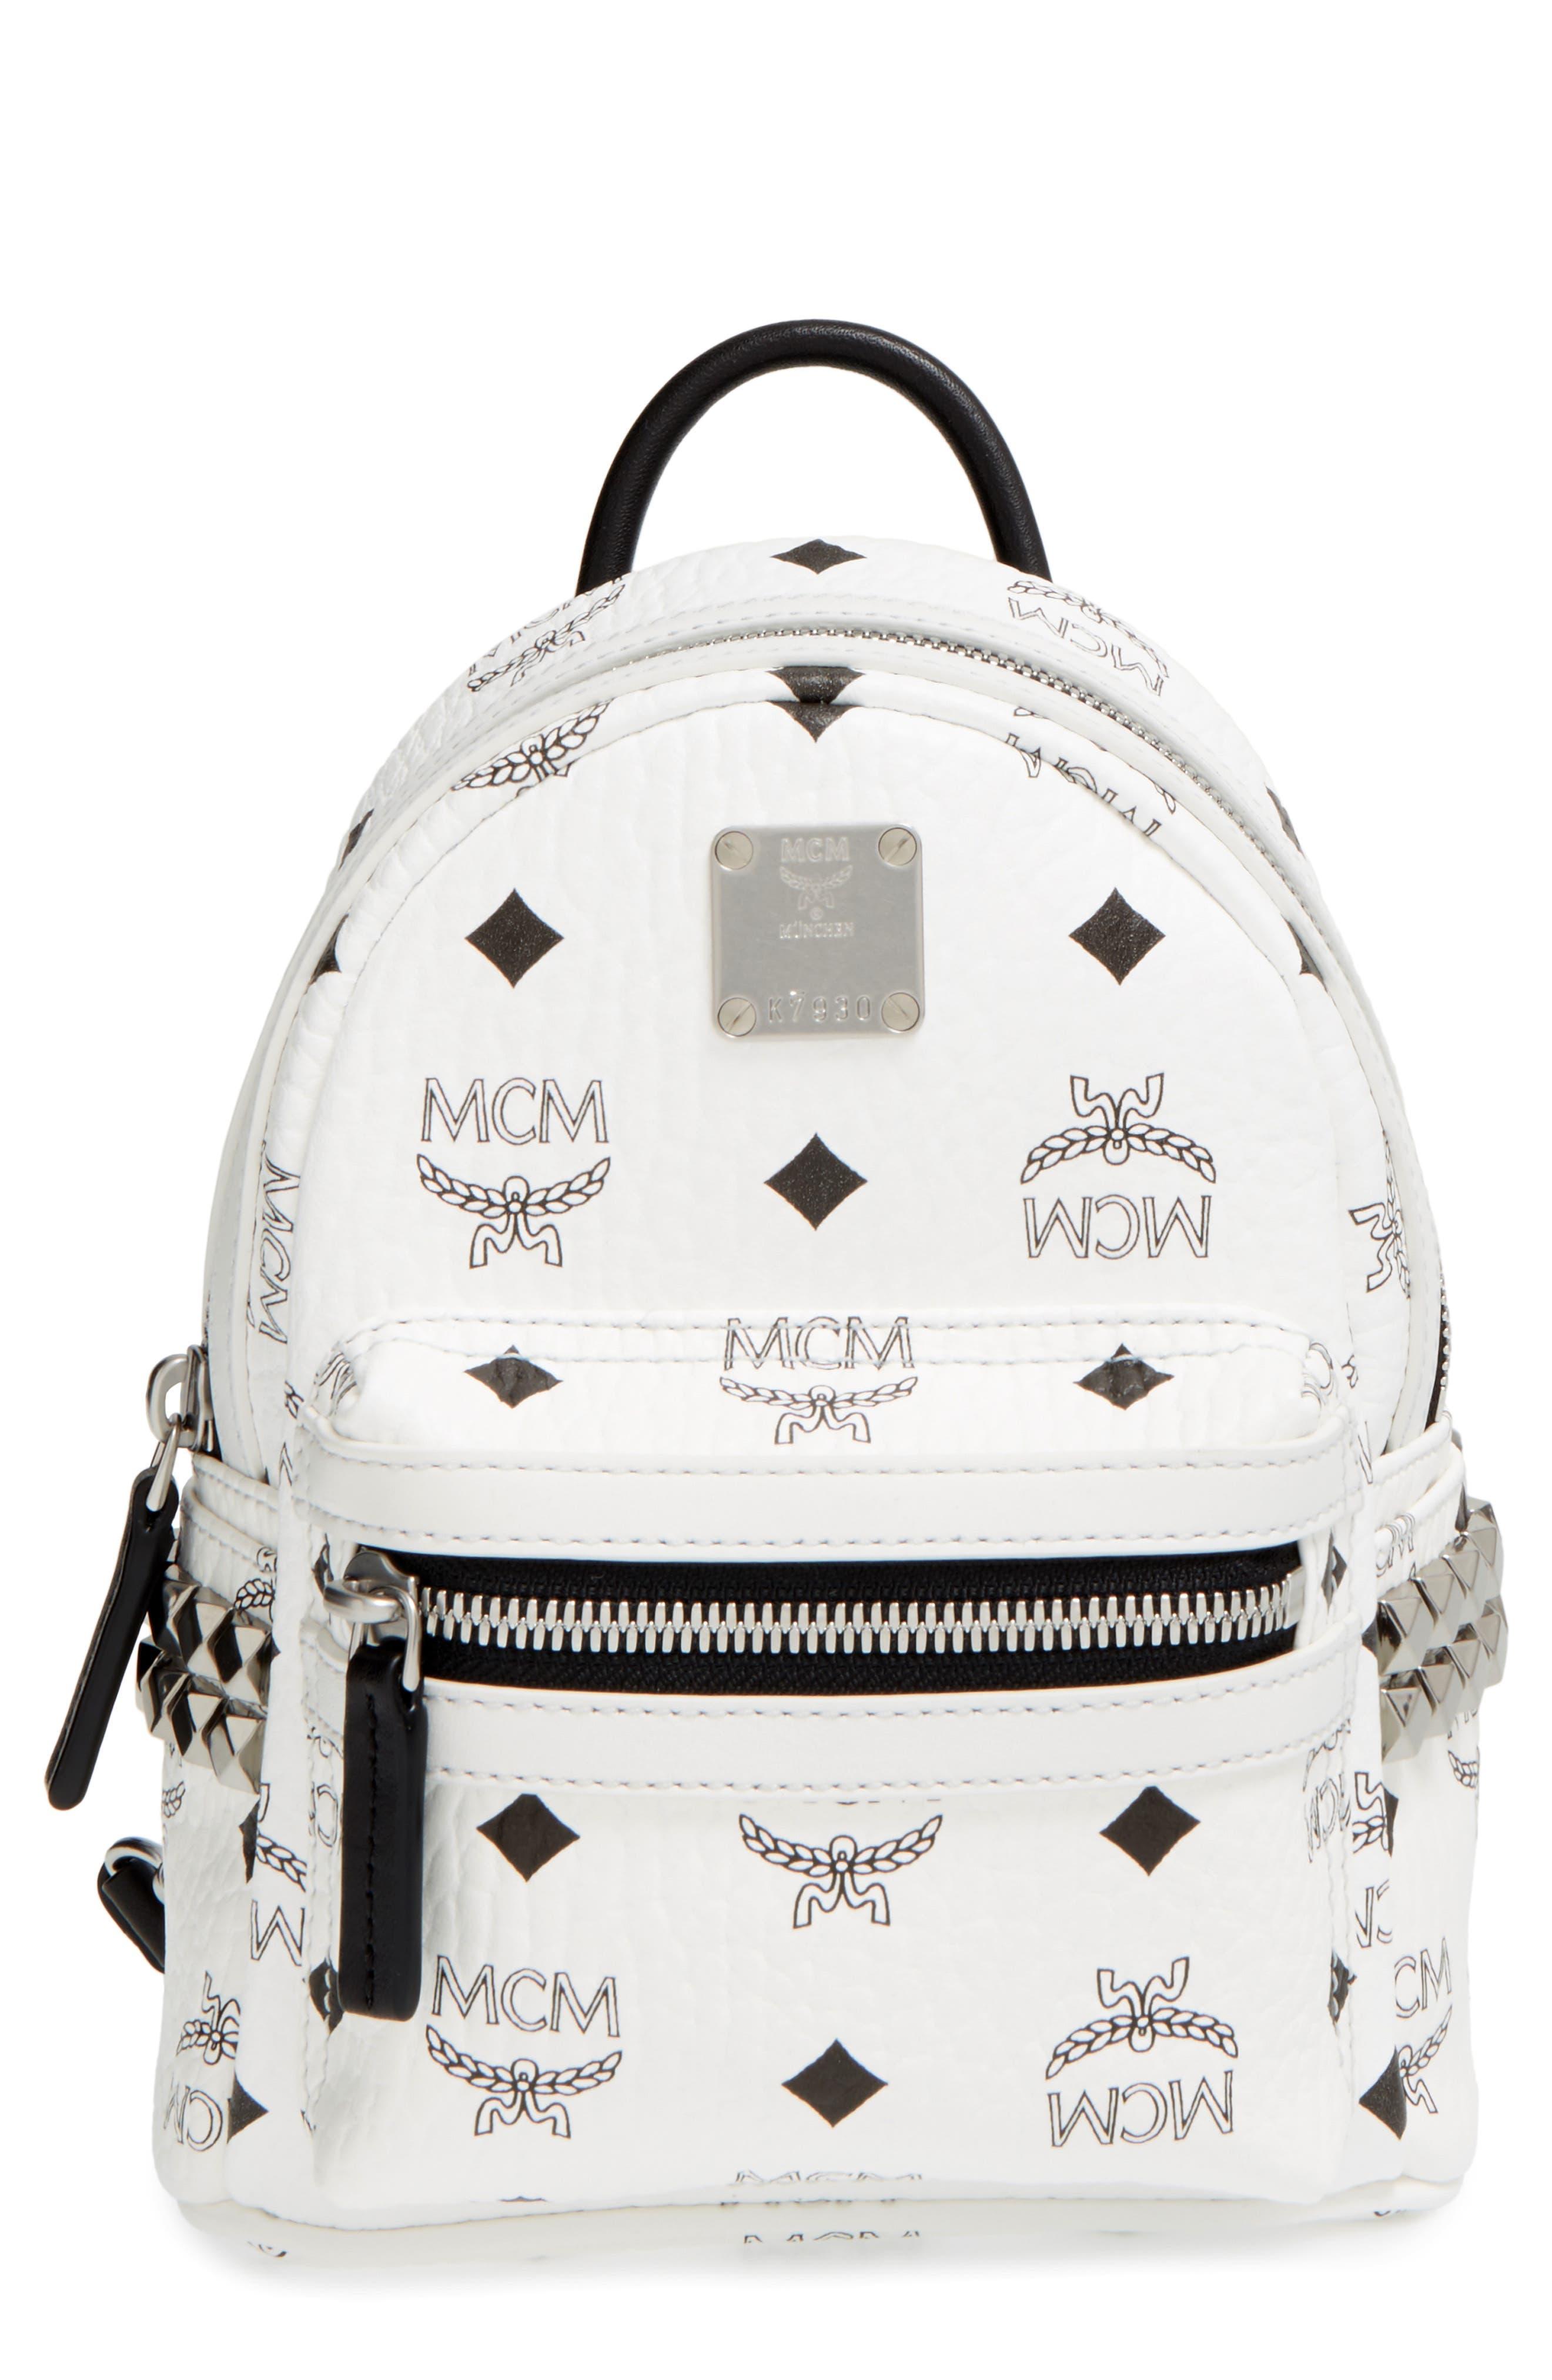 MCM, 'X-Mini Stark Side Stud' Convertible Backpack, Main thumbnail 1, color, WHITE